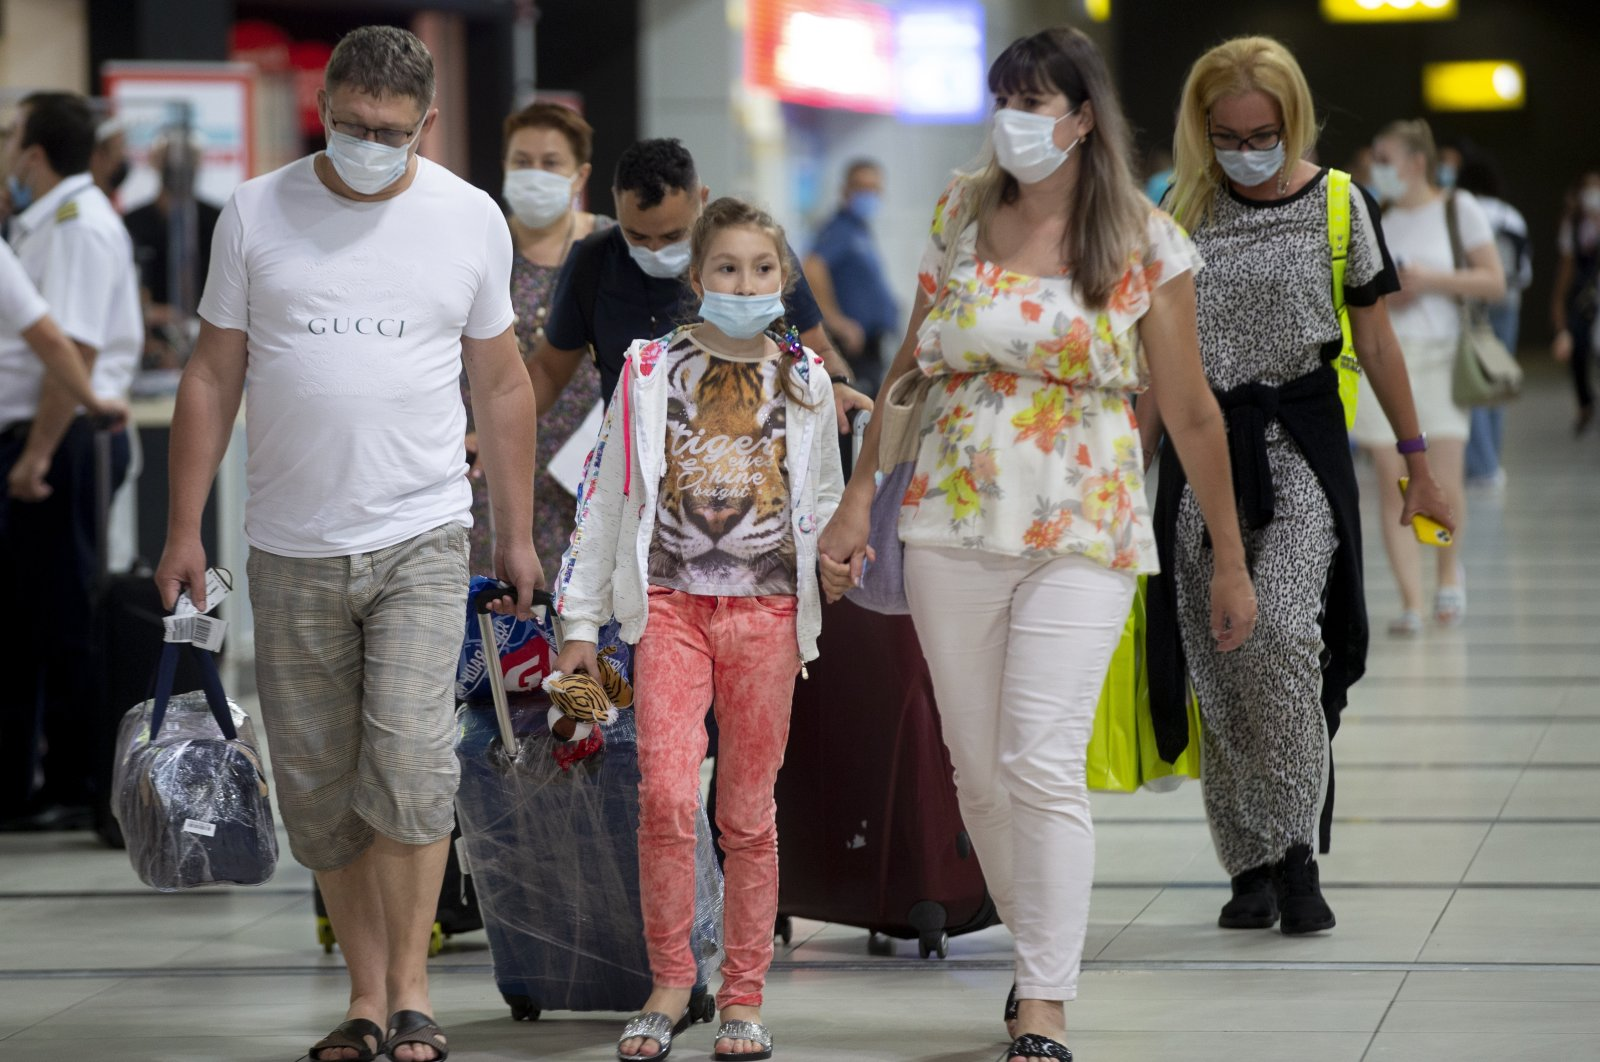 Russian tourists arrive at Antalya Airport in Antalya, southern Turkey, Aug. 16, 2020. (AA Photo)